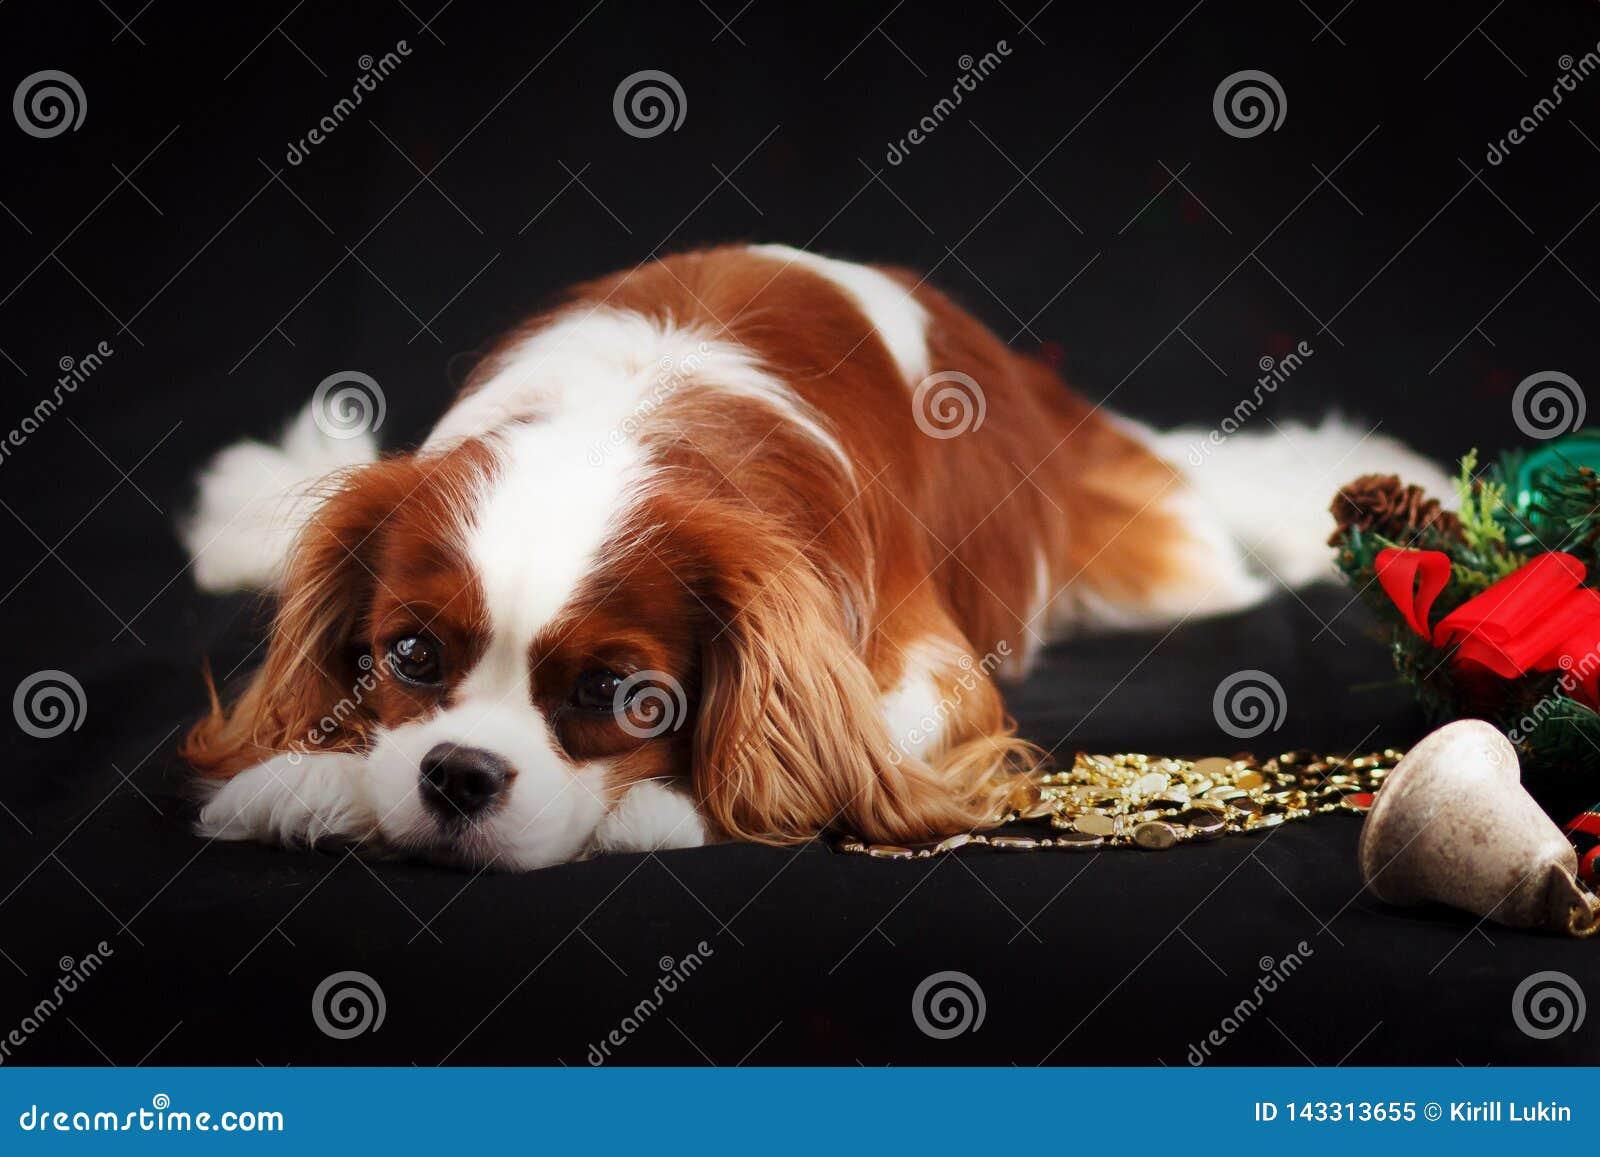 Christmas photo of cavalier king charles spaniel on black background